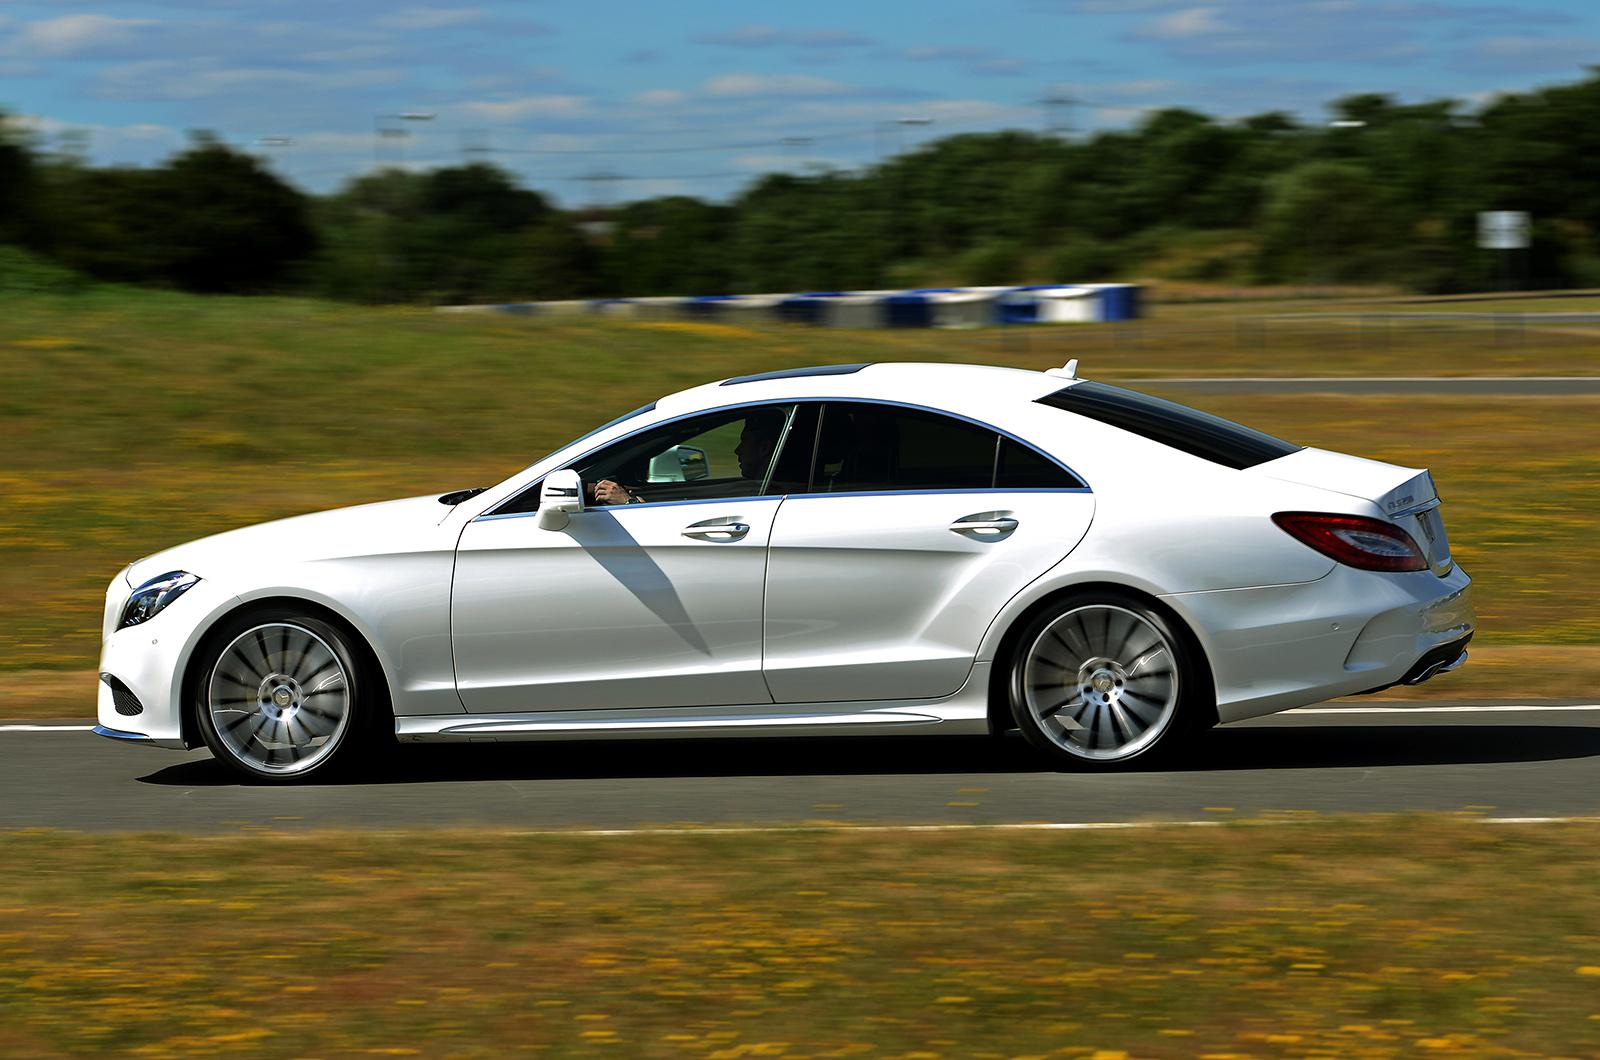 All Types cls mercedes 2015 : Mercedes-Benz CLS 350 Bluetec first drive review